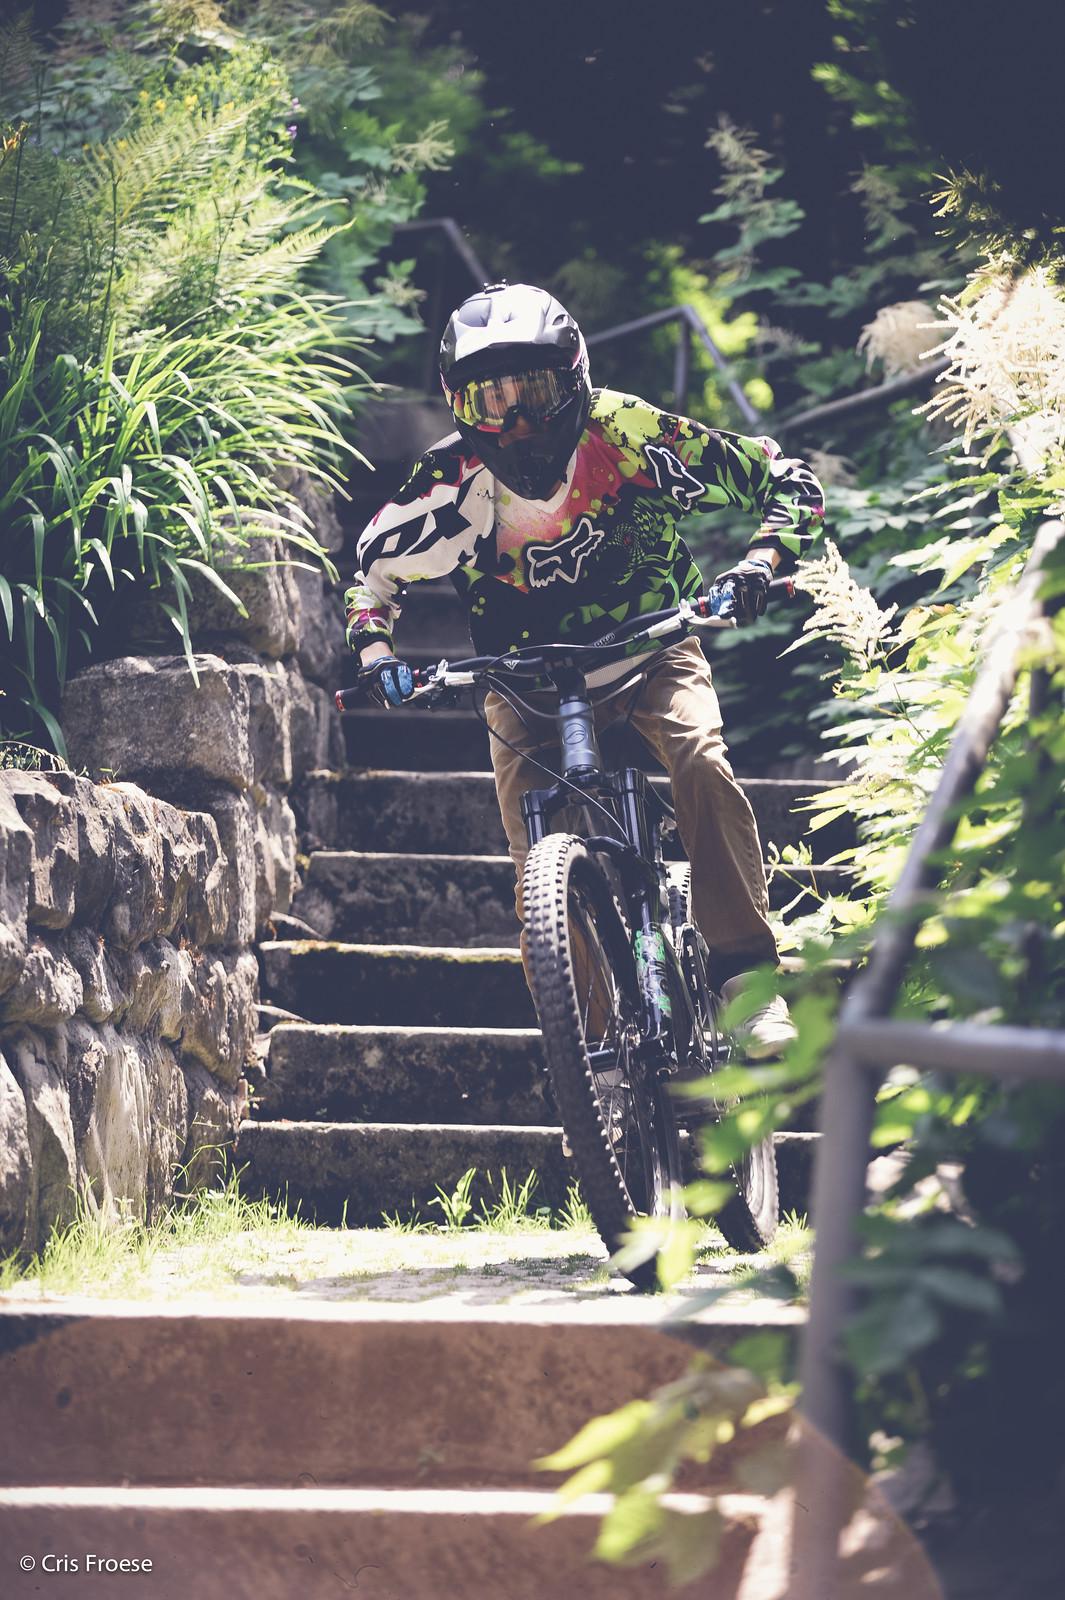 qra splash-15 - MouflonsRiders - Mountain Biking Pictures - Vital MTB